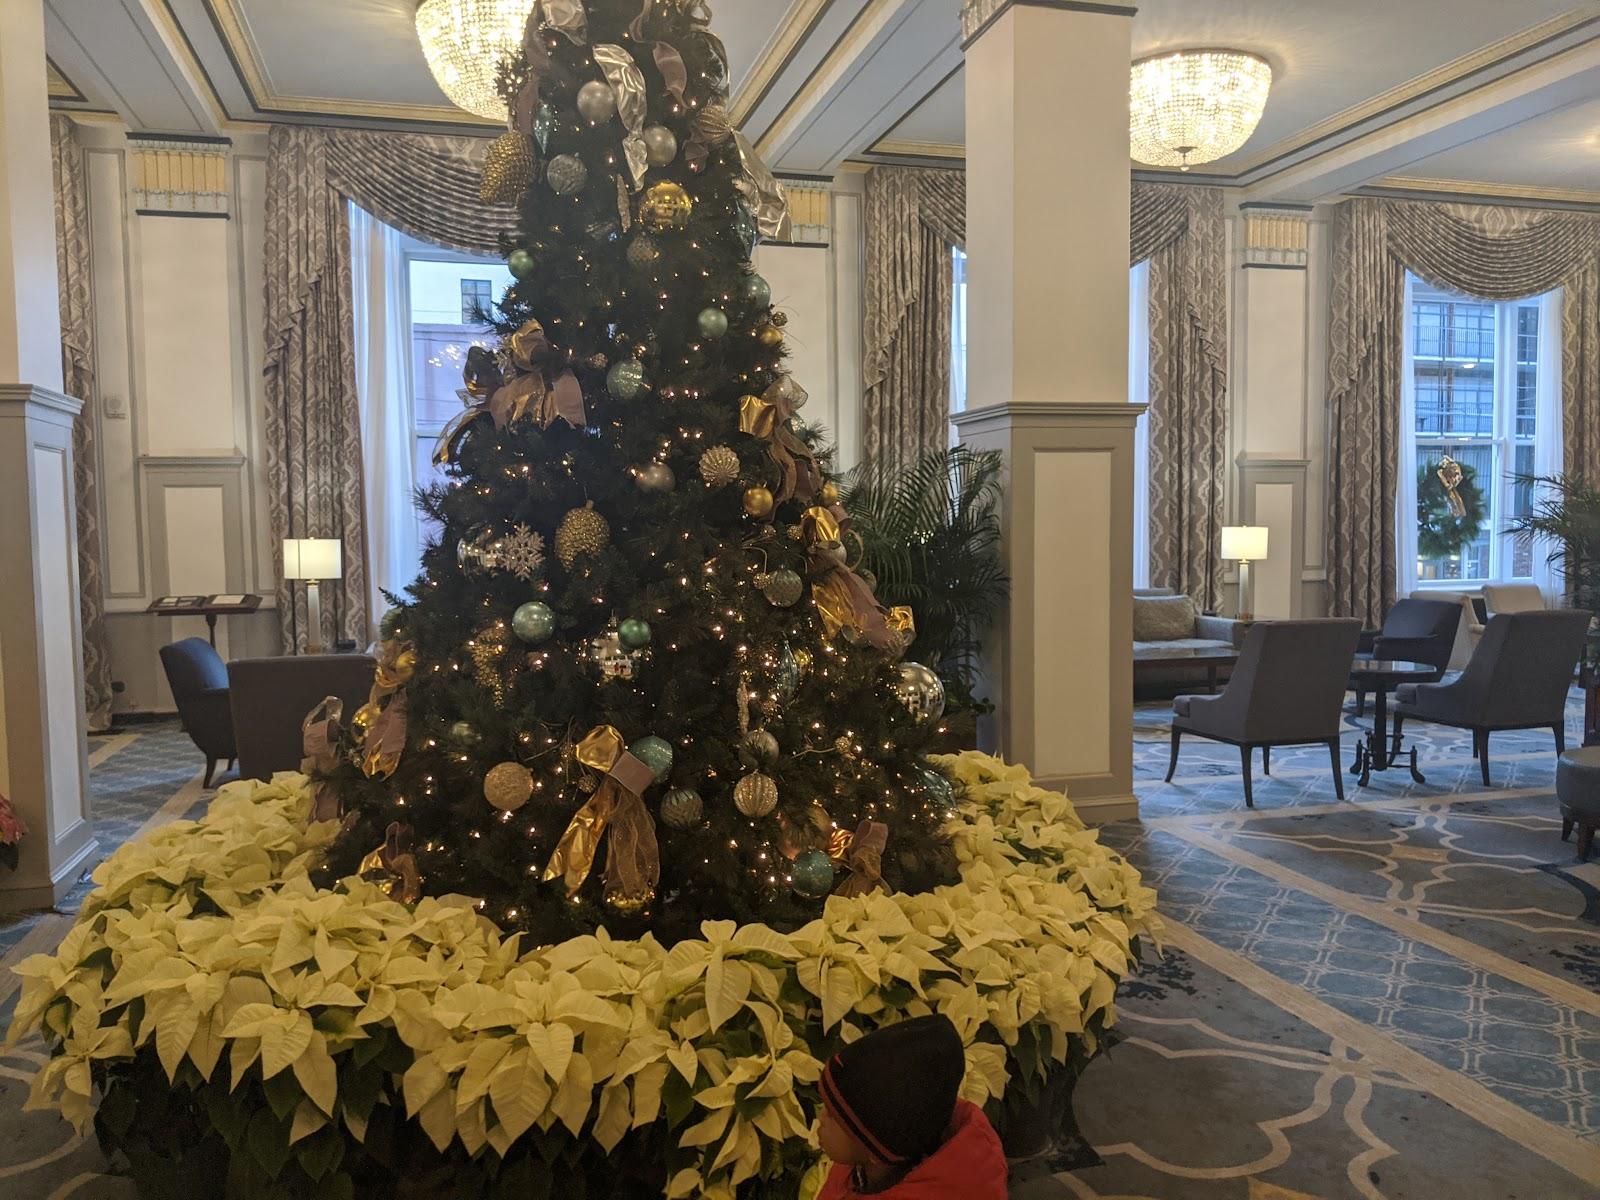 LS8zsAFp0THk1cF3Yn3XIFXYa0W7L_Vrz8h2xSJsdbcFTG3sfzB84qxz8_fXWvMrwki-9UkFUetgUBHz035PP5-Bgjhhm52PWtqu8vv4bg1DQ4WohvwmYy7vuj2RWhtTf1BVujeb Classic Holiday Style and Family Fun in Charleston, SC